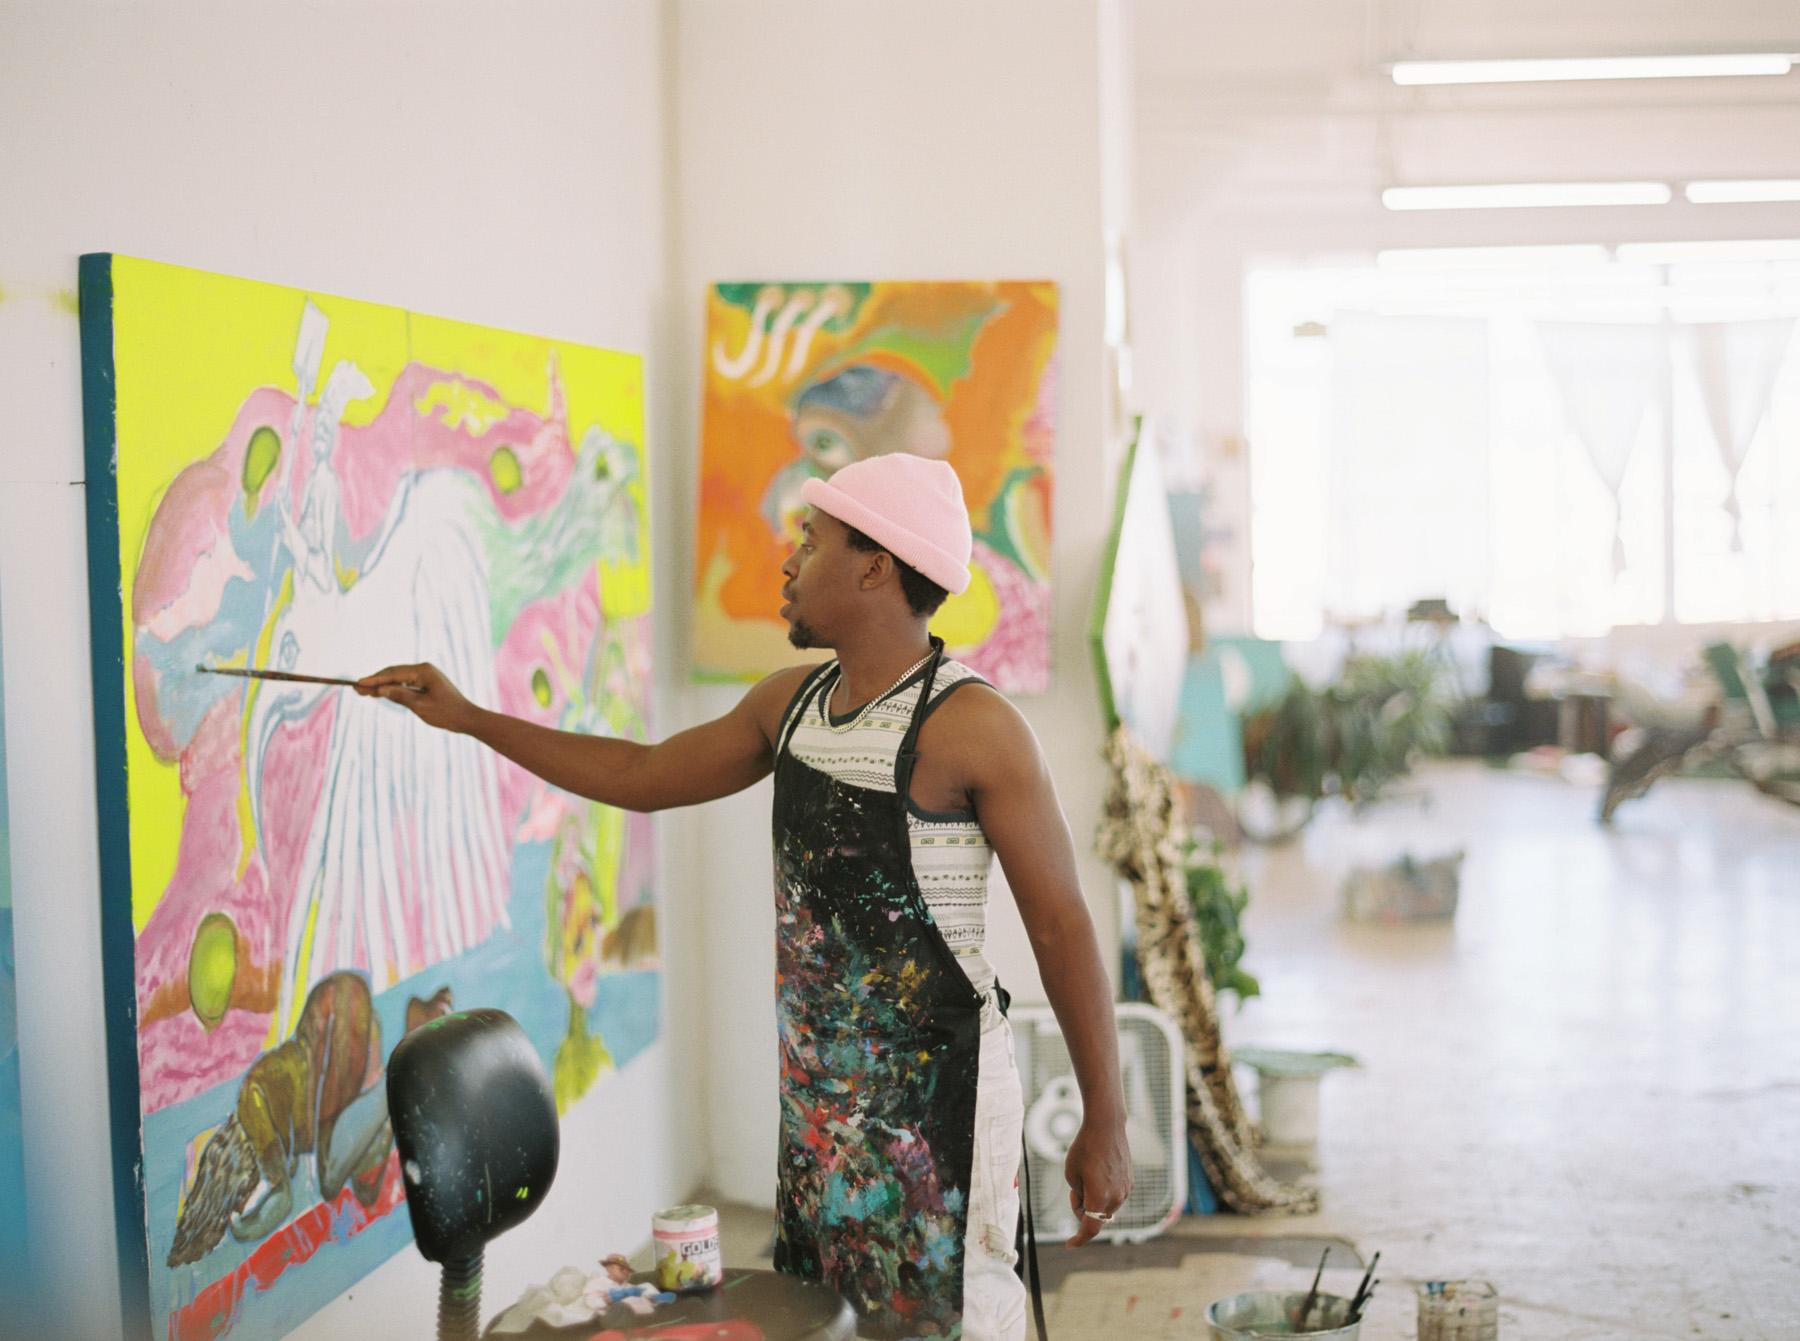 Simphiwe Ndzube, Justin Chung, Studio Visit